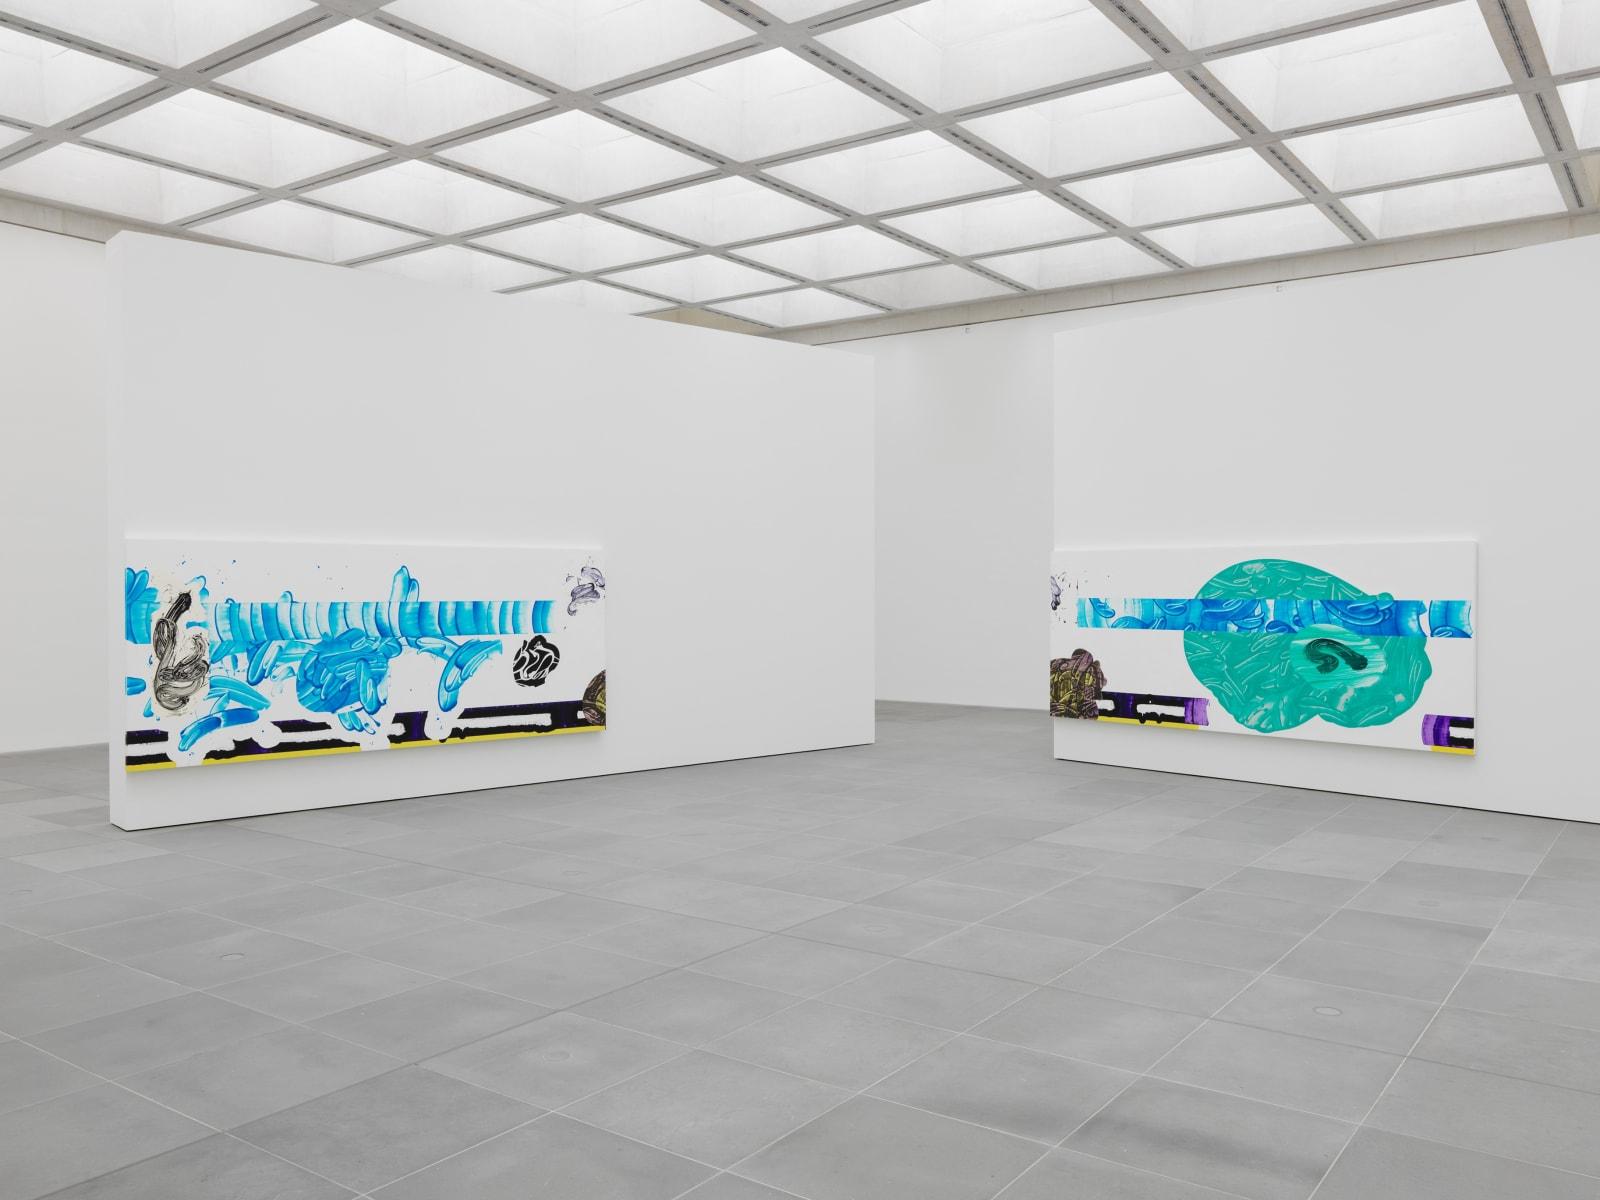 Ausstellungsansicht Vice and Reflection #2, Neues Museum Nürnberg, 2019, Courtesy of Häusler Contemporary   Photo: NMN (Annette Kadisch)